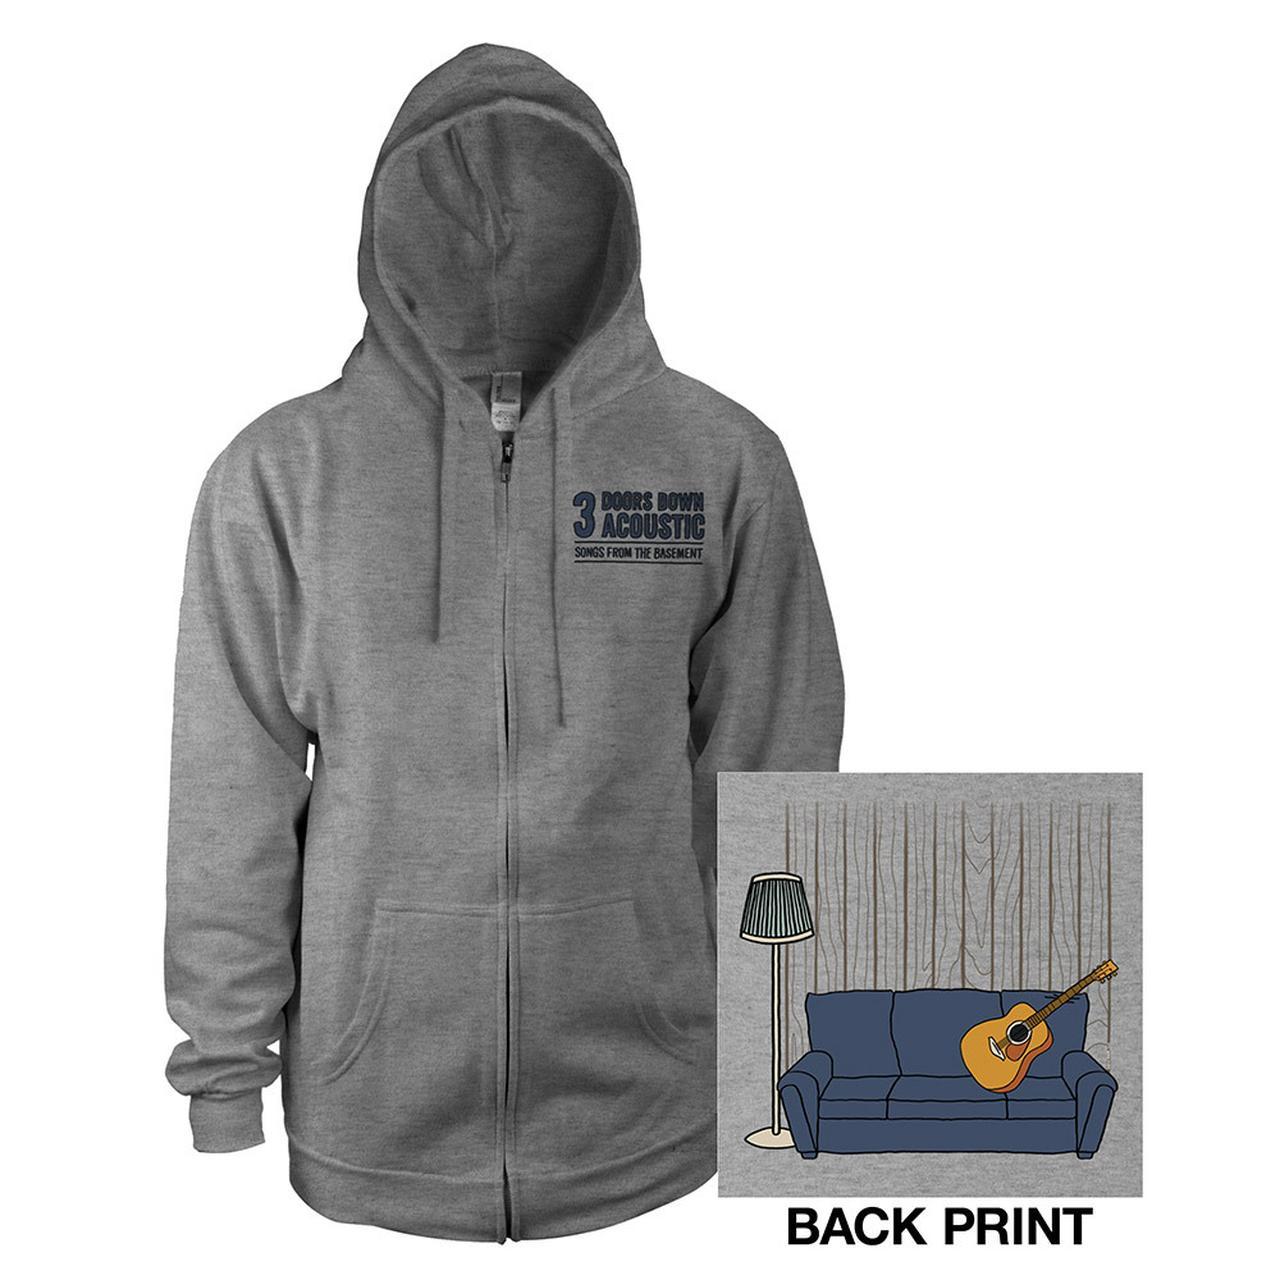 3 Doors Down. Acoustic Zip Hoodie  sc 1 st  Merchbar & 3 Doors Down Acoustic Zip Hoodie